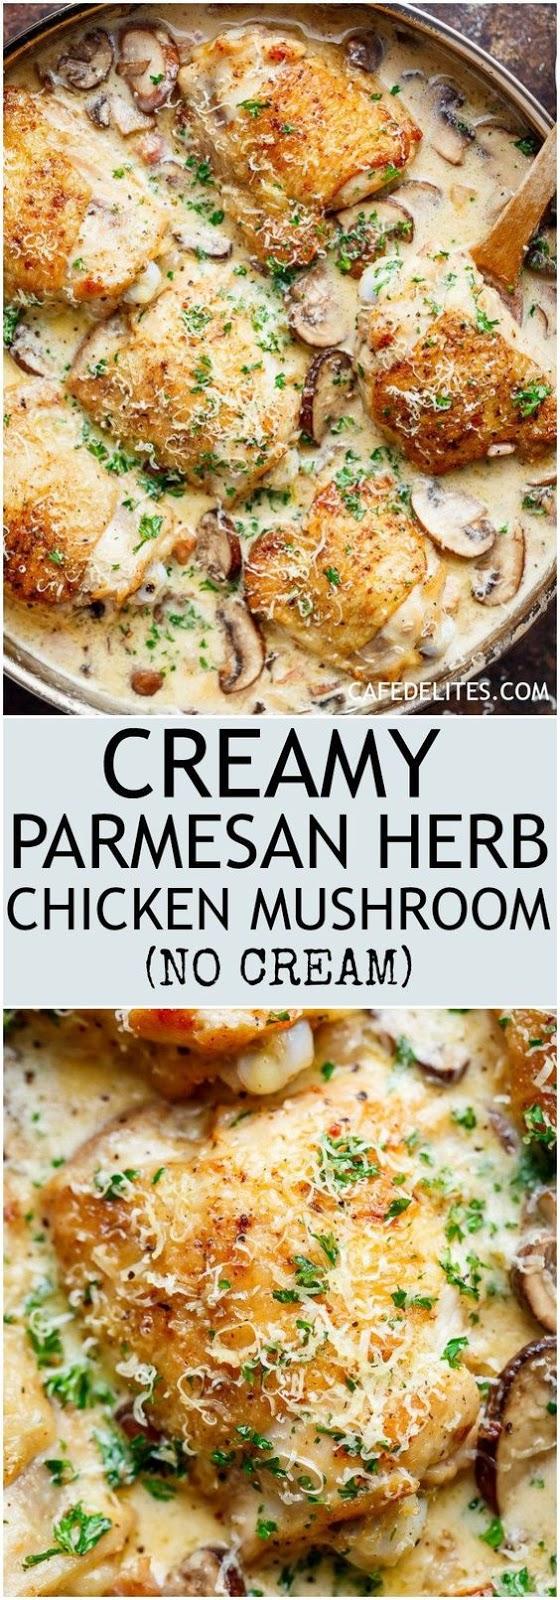 creamy parmesan herb chicken mushroom (no cream option) #recipes #dinnerrecipes #dinnerideas #newdinnerrecipes #newdinnerideas #newdinnerrecipeideas #food #foodporn #healthy #yummy #instafood #foodie #delicious #dinner #breakfast #dessert #lunch #vegan #cake #eatclean #homemade #diet #healthyfood #cleaneating #foodstagram